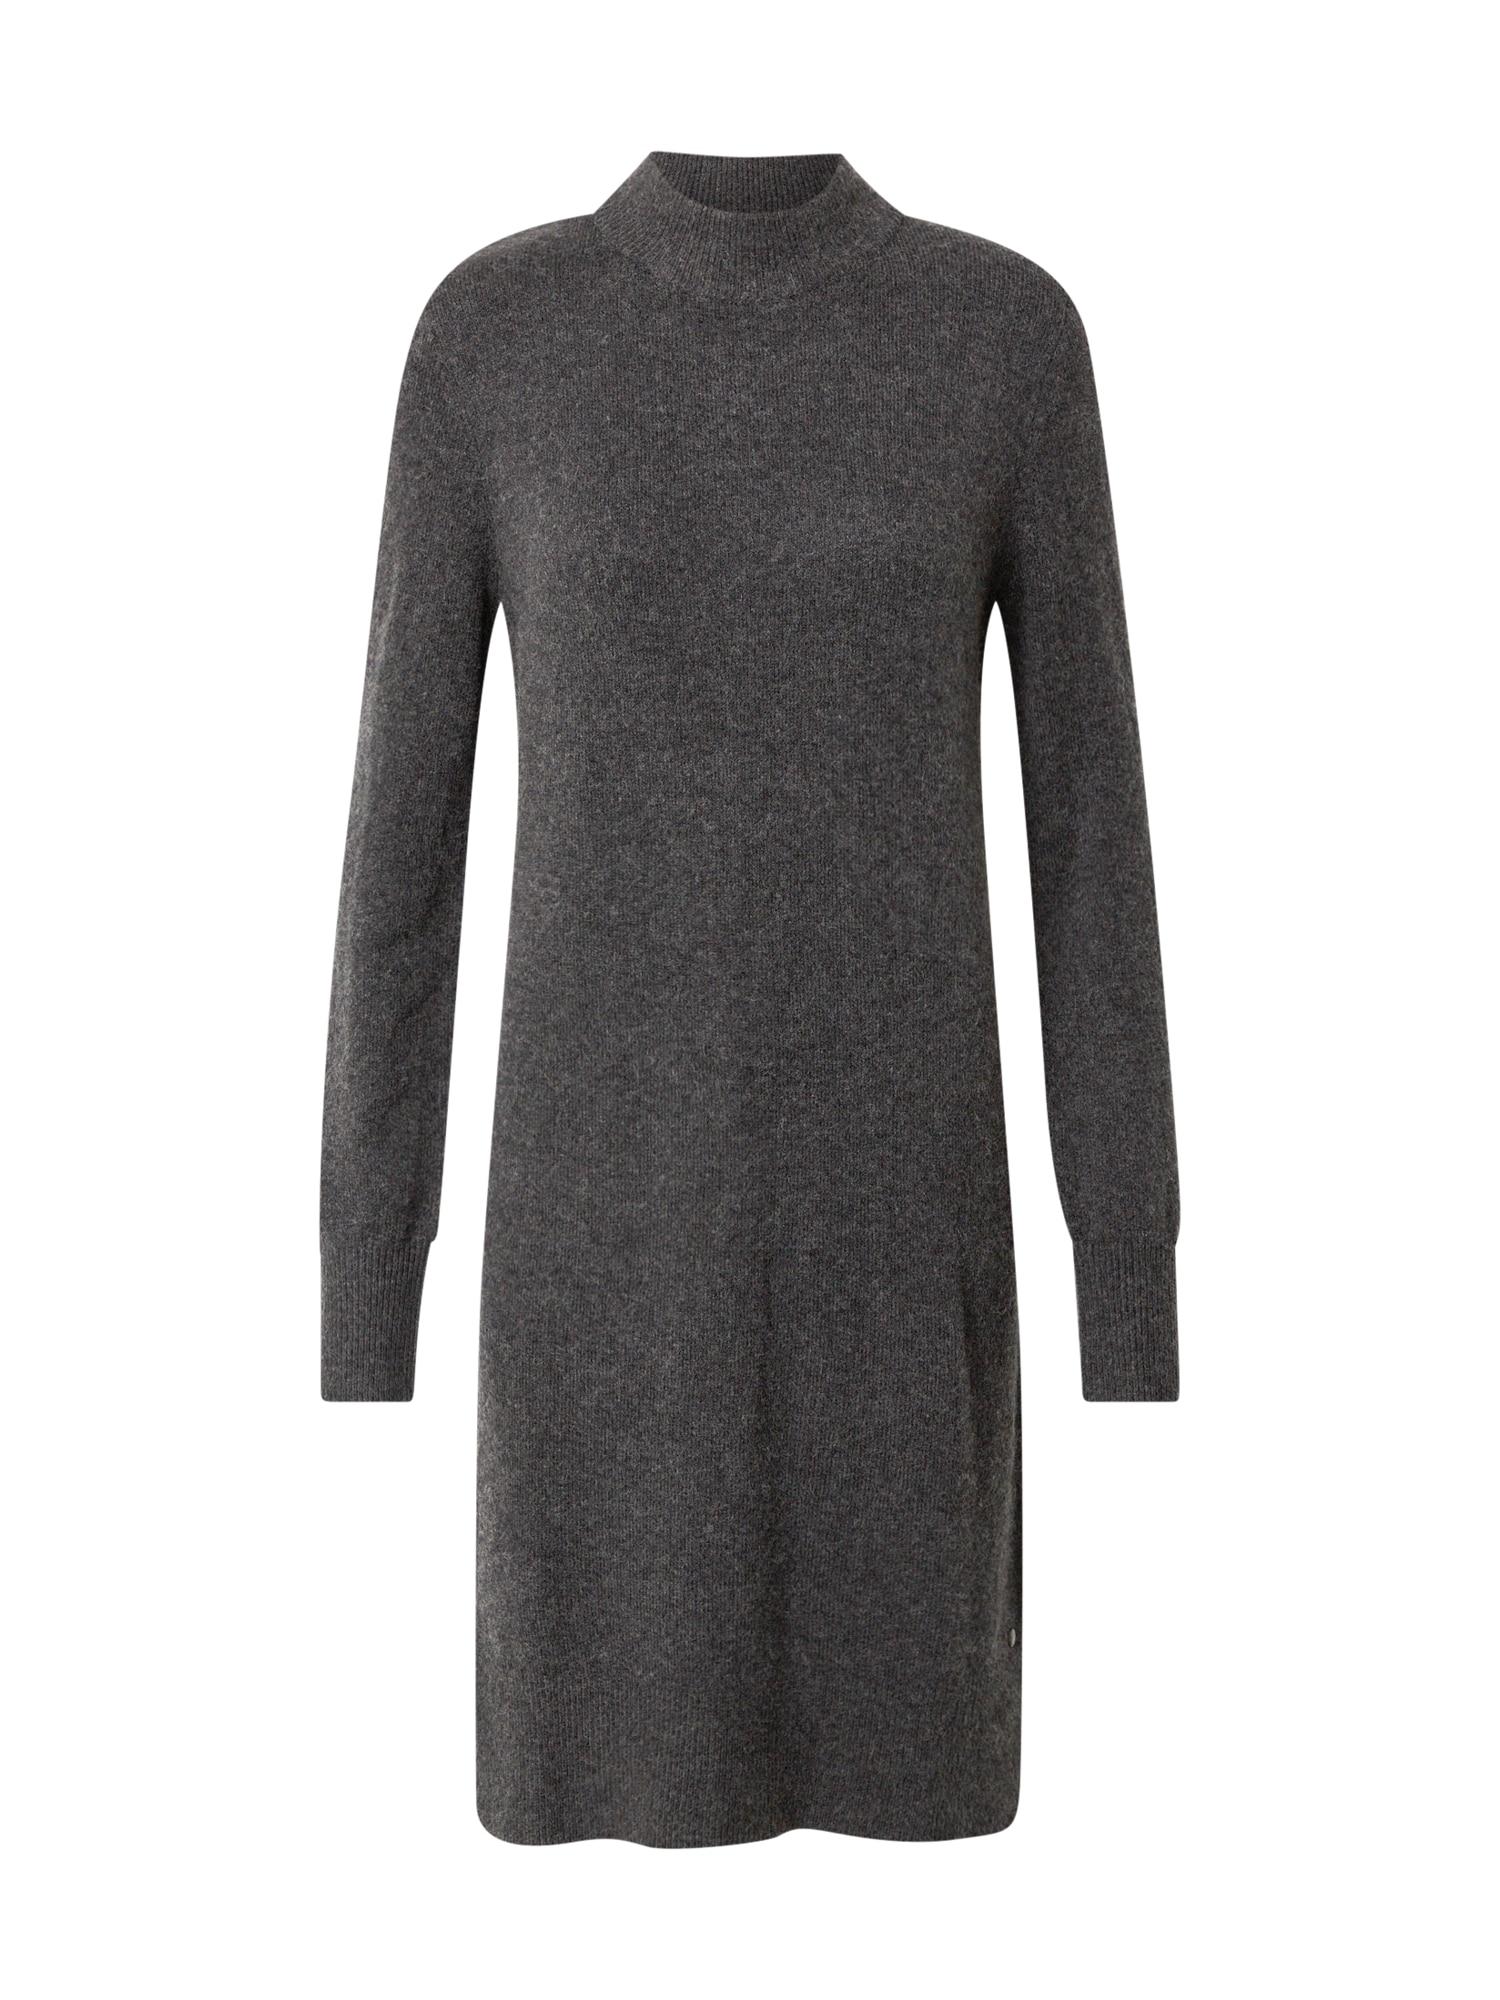 TOM TAILOR Úpletové šaty  tmavě šedá